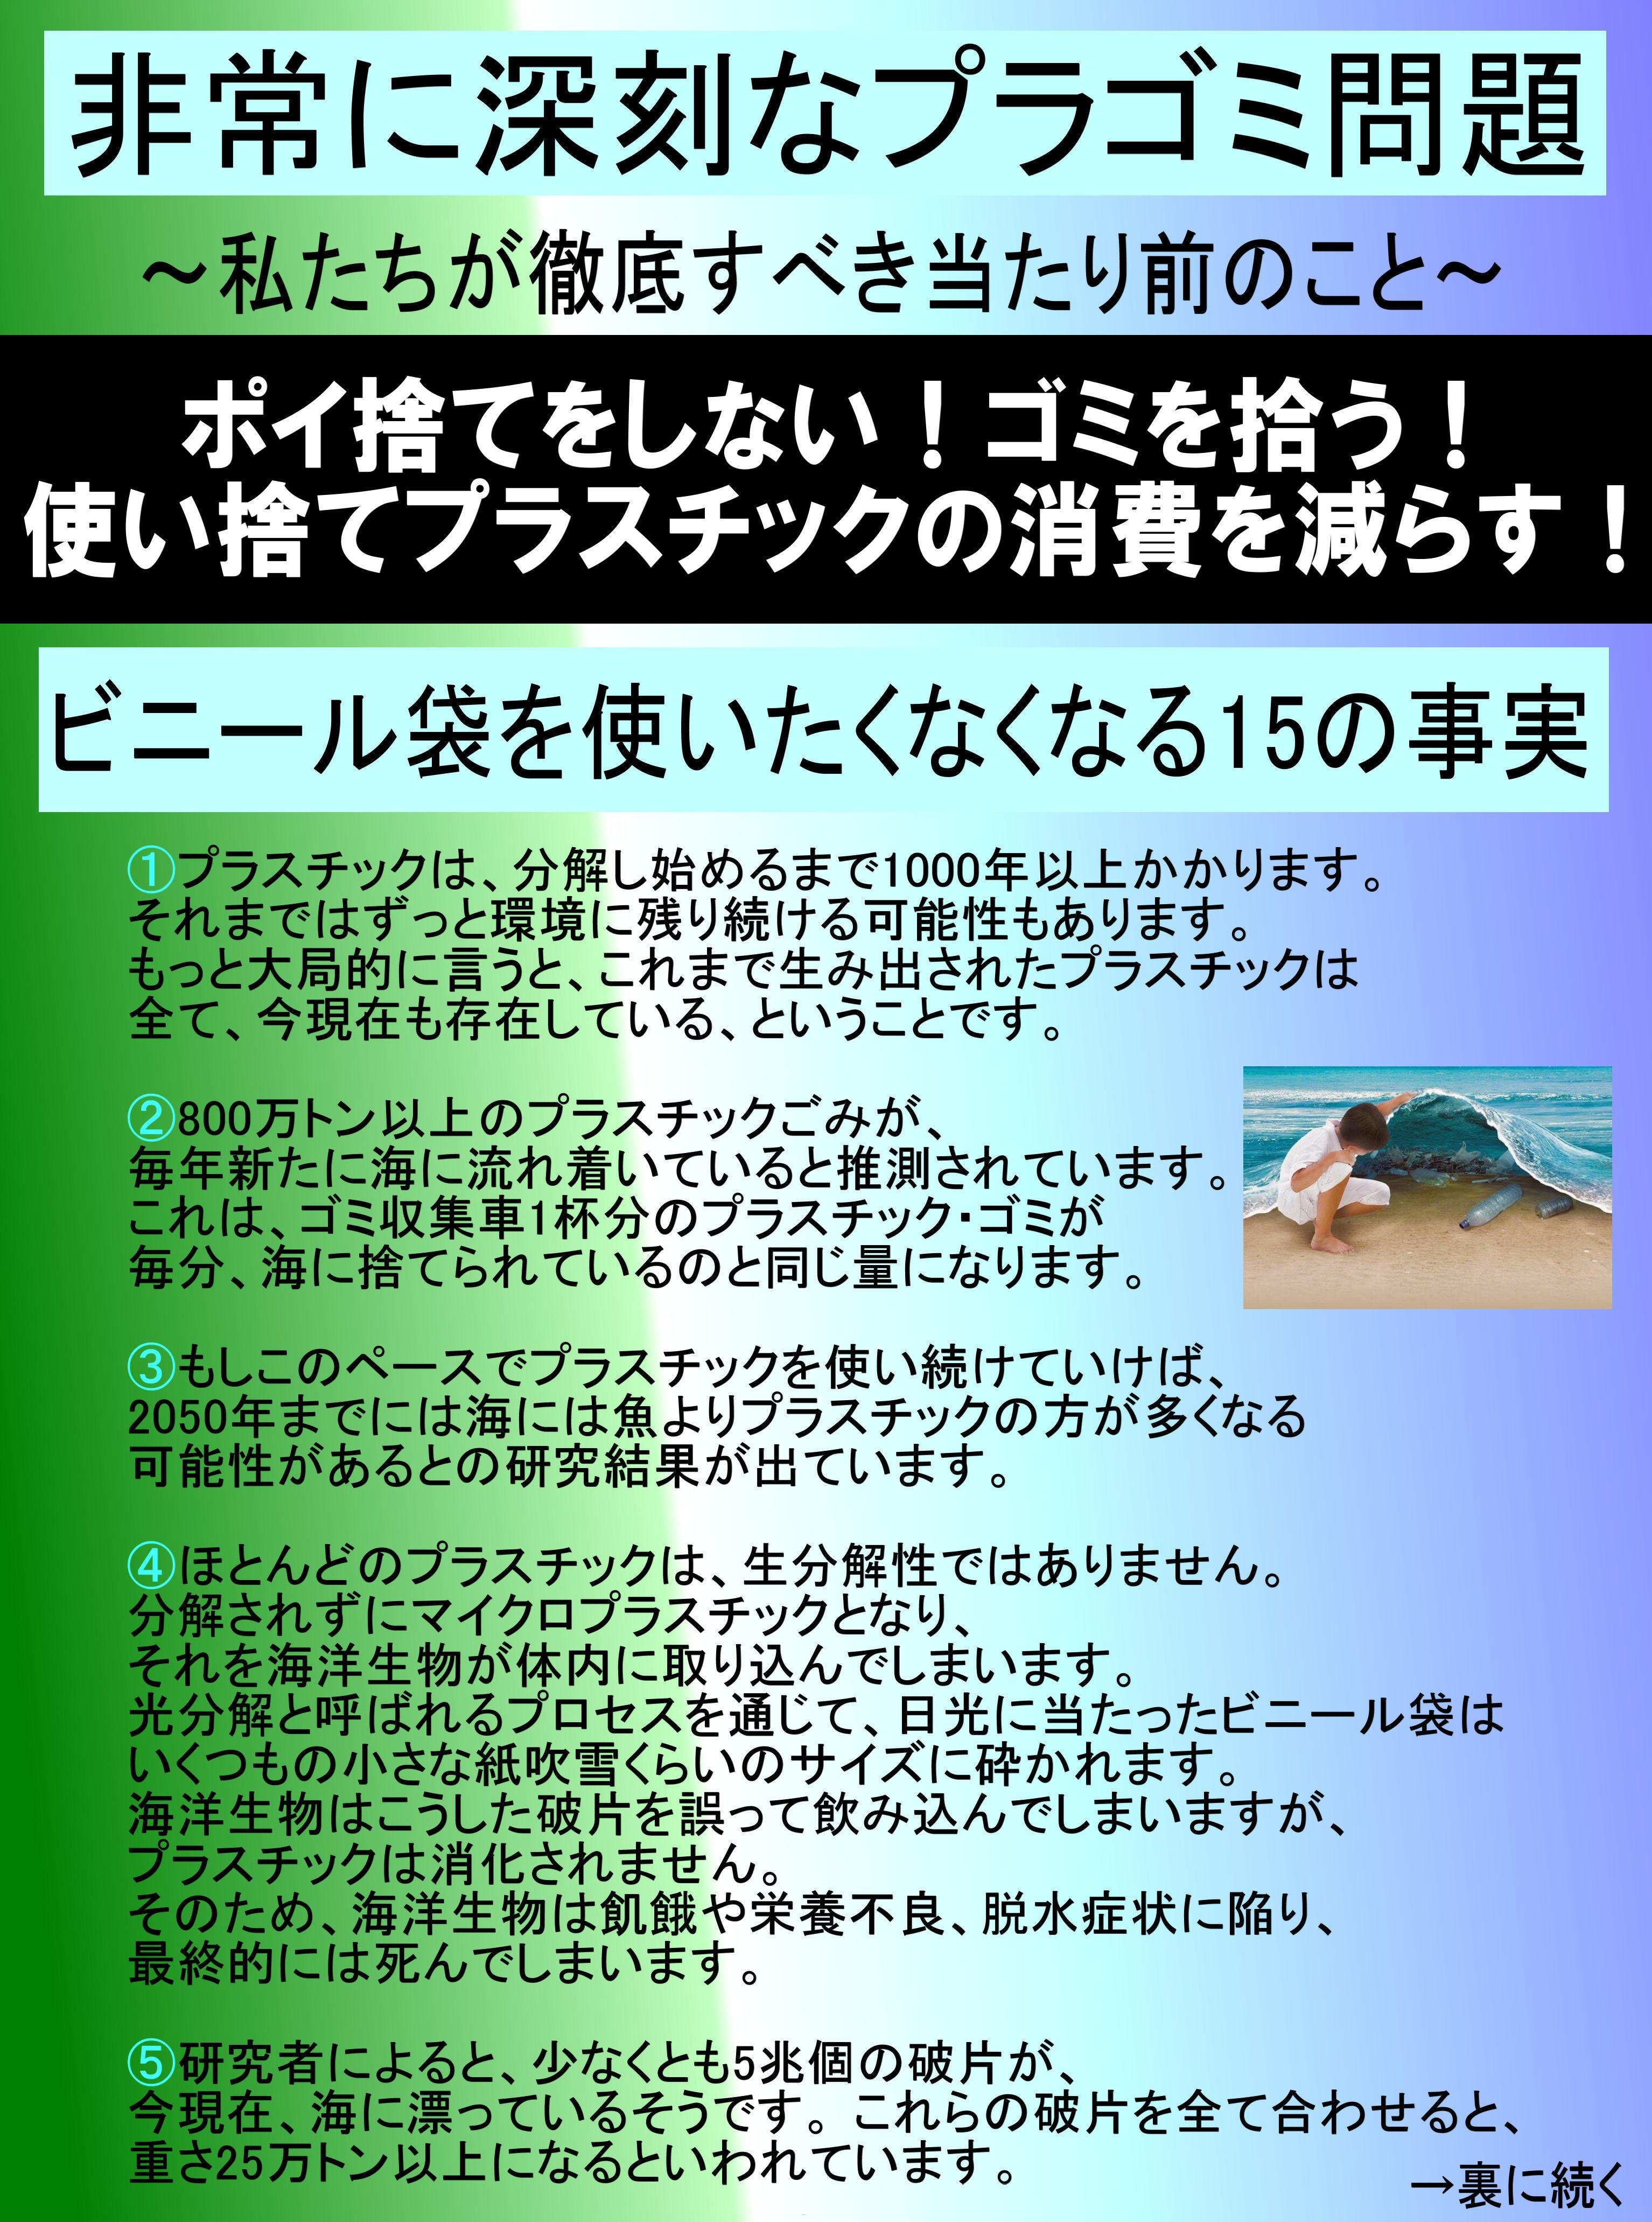 gomichirashi1b.jpg